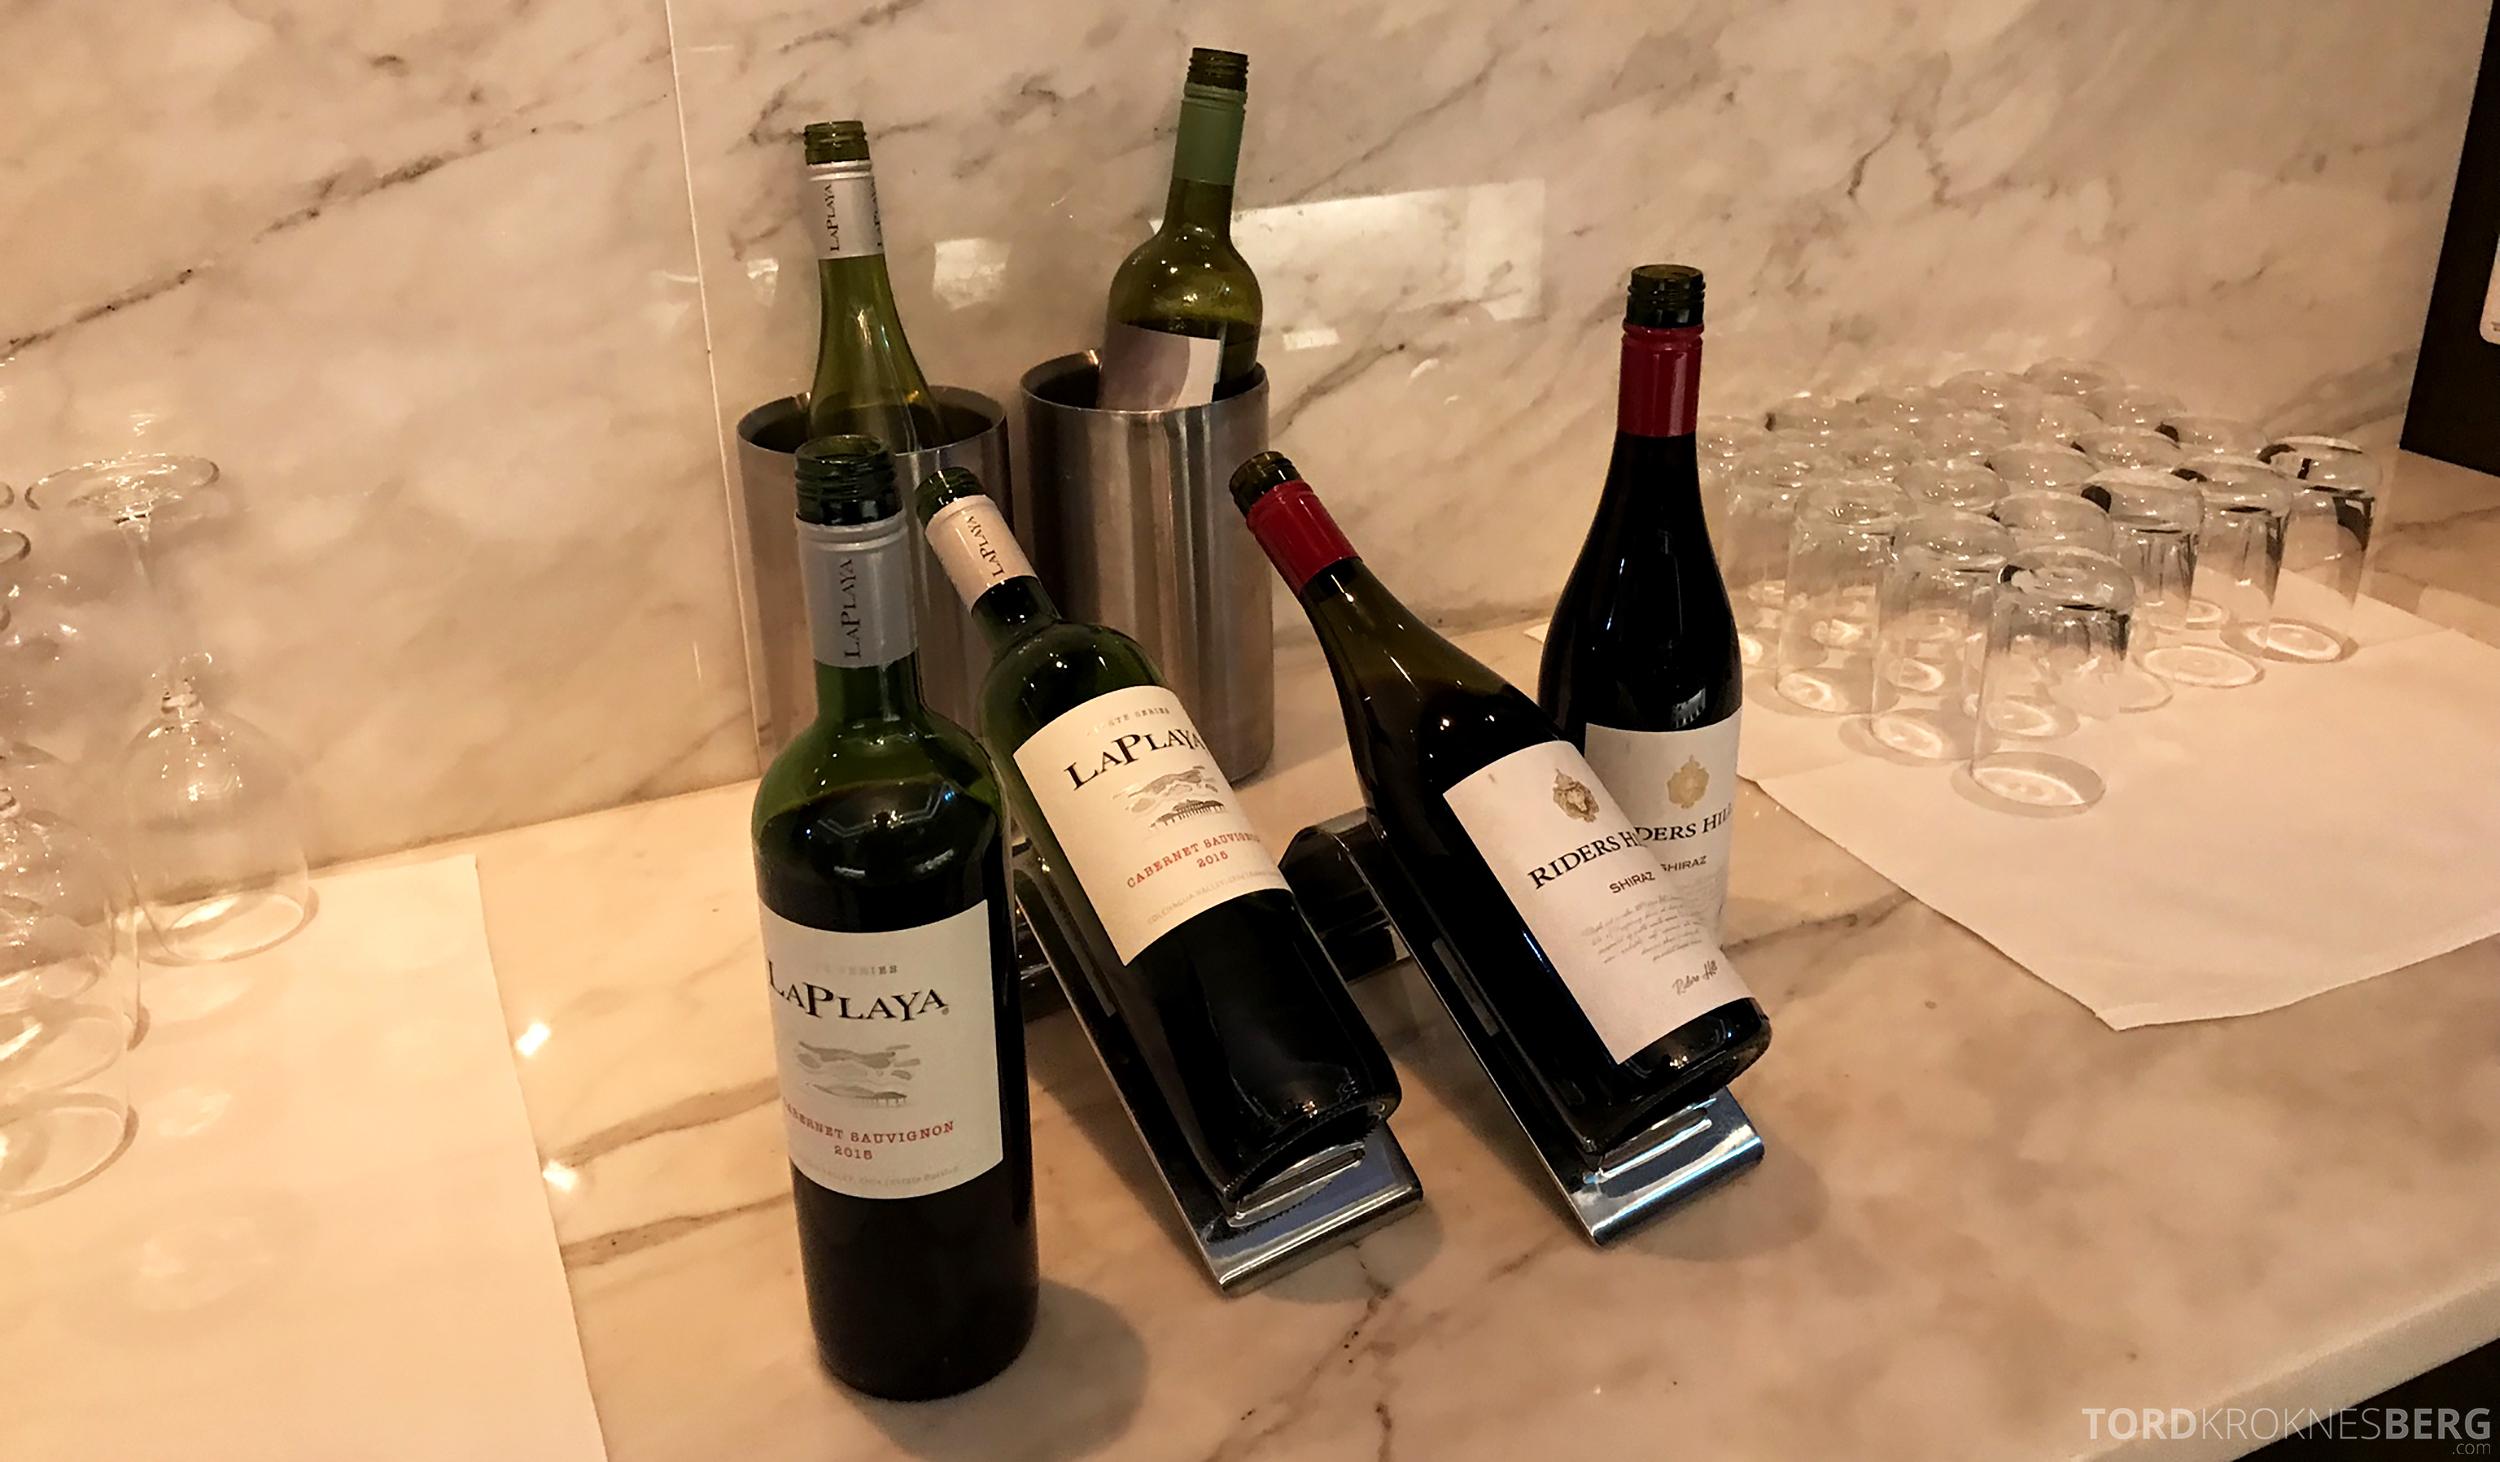 Marriott Copenhagen Hotel Executive Lounge vin